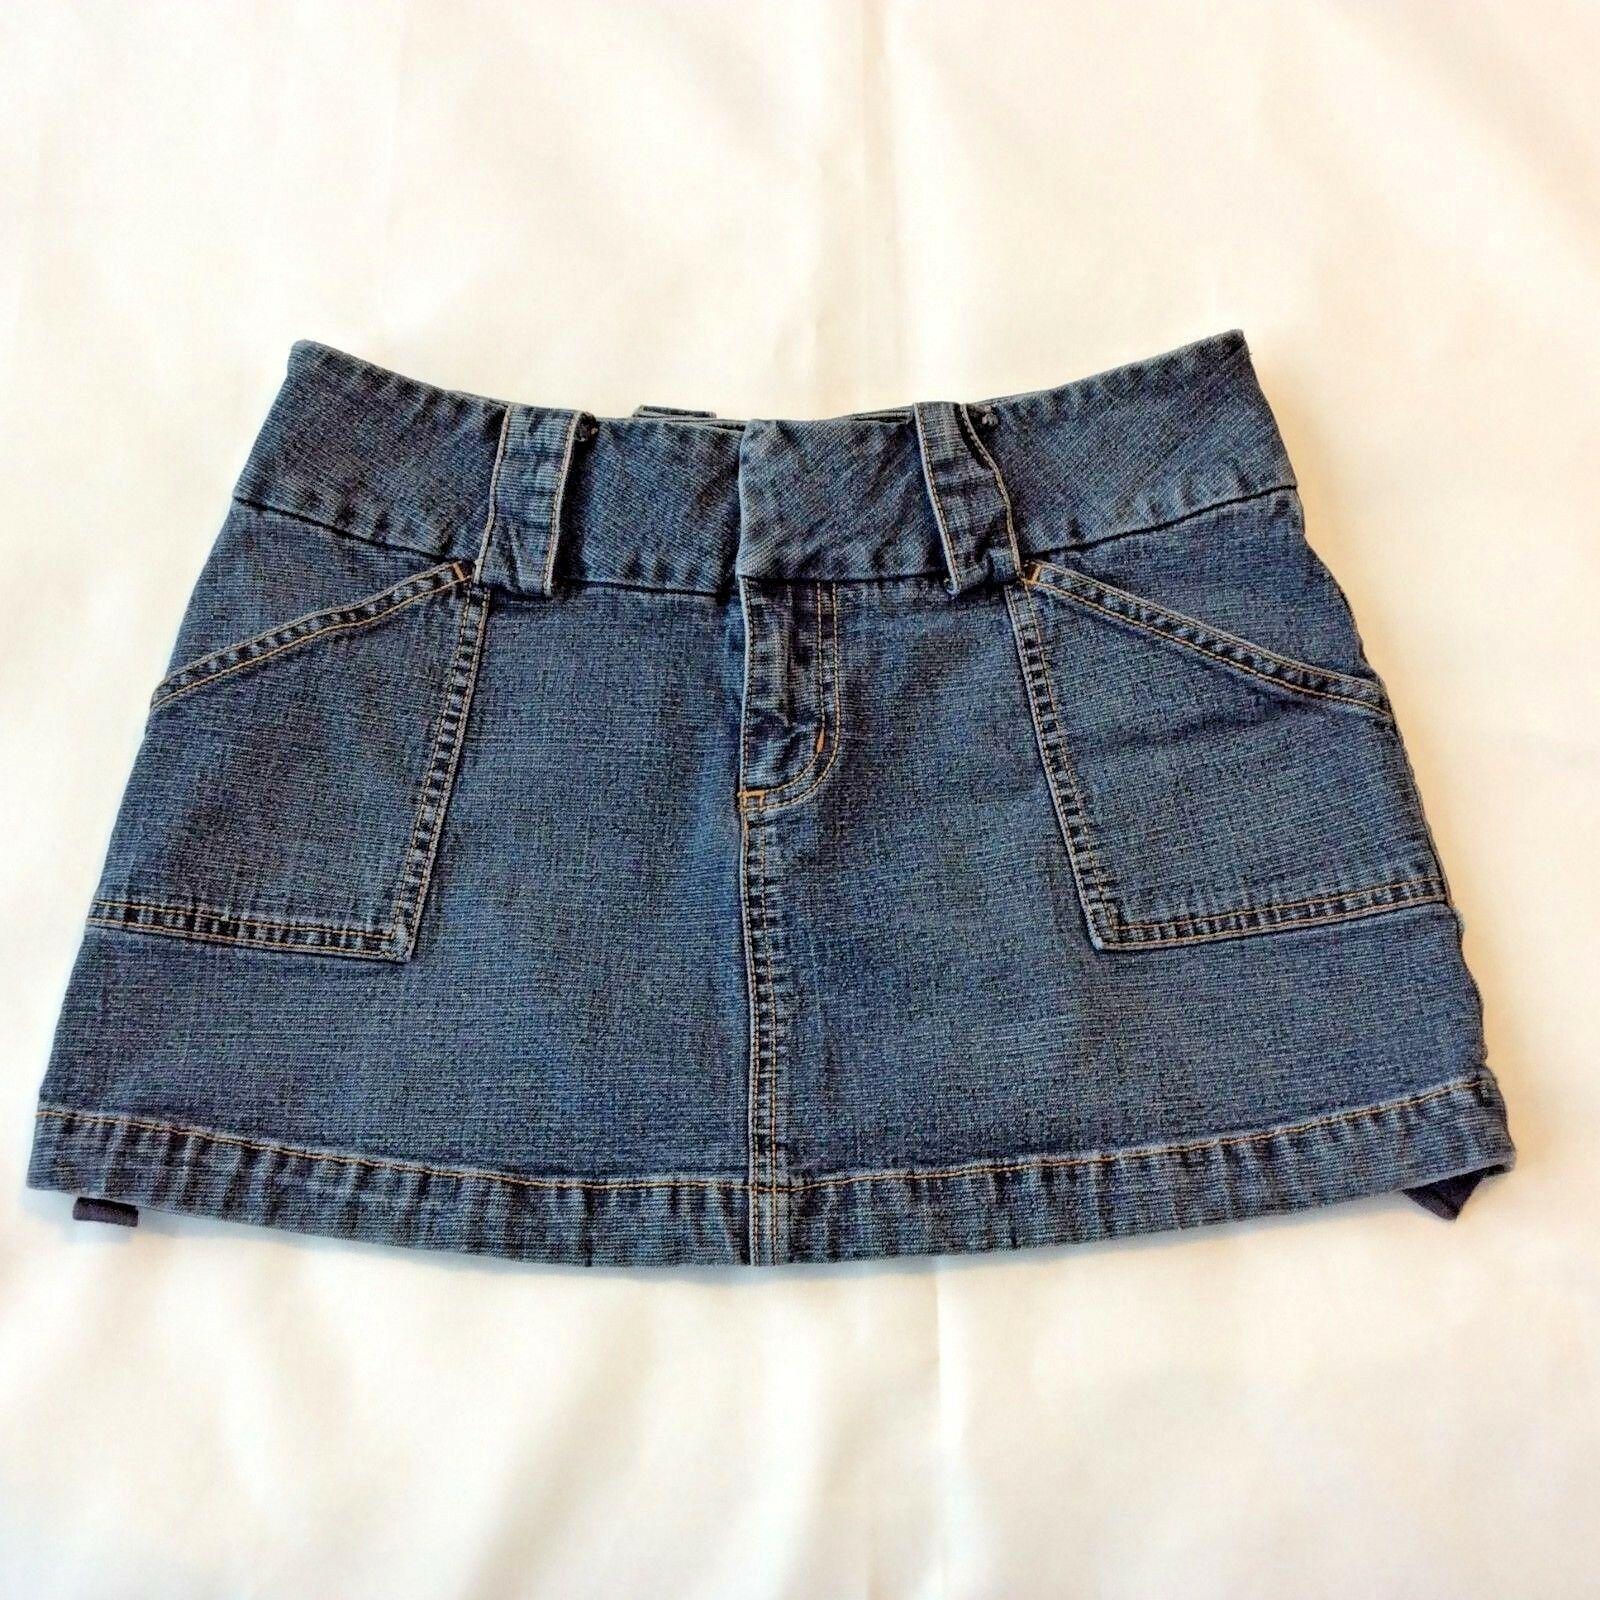 Guess Vintage Mini Skirt Micro Short Size 28 6 Cinch Hem Womens Blue Jean Denim